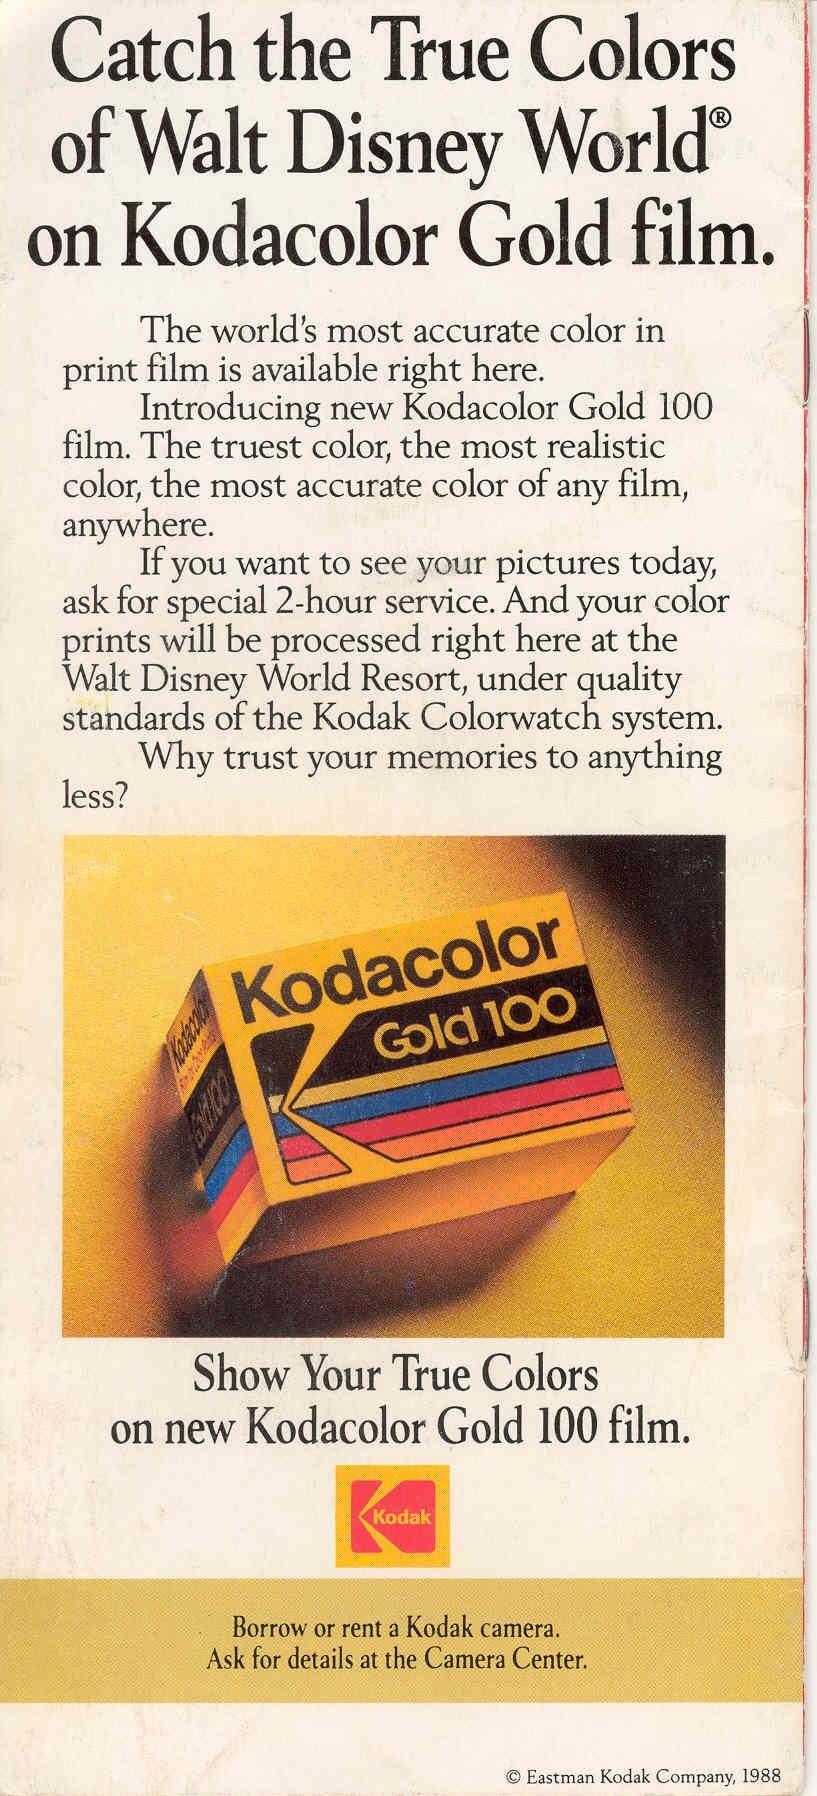 Magic Kingdom Guide Book 1988